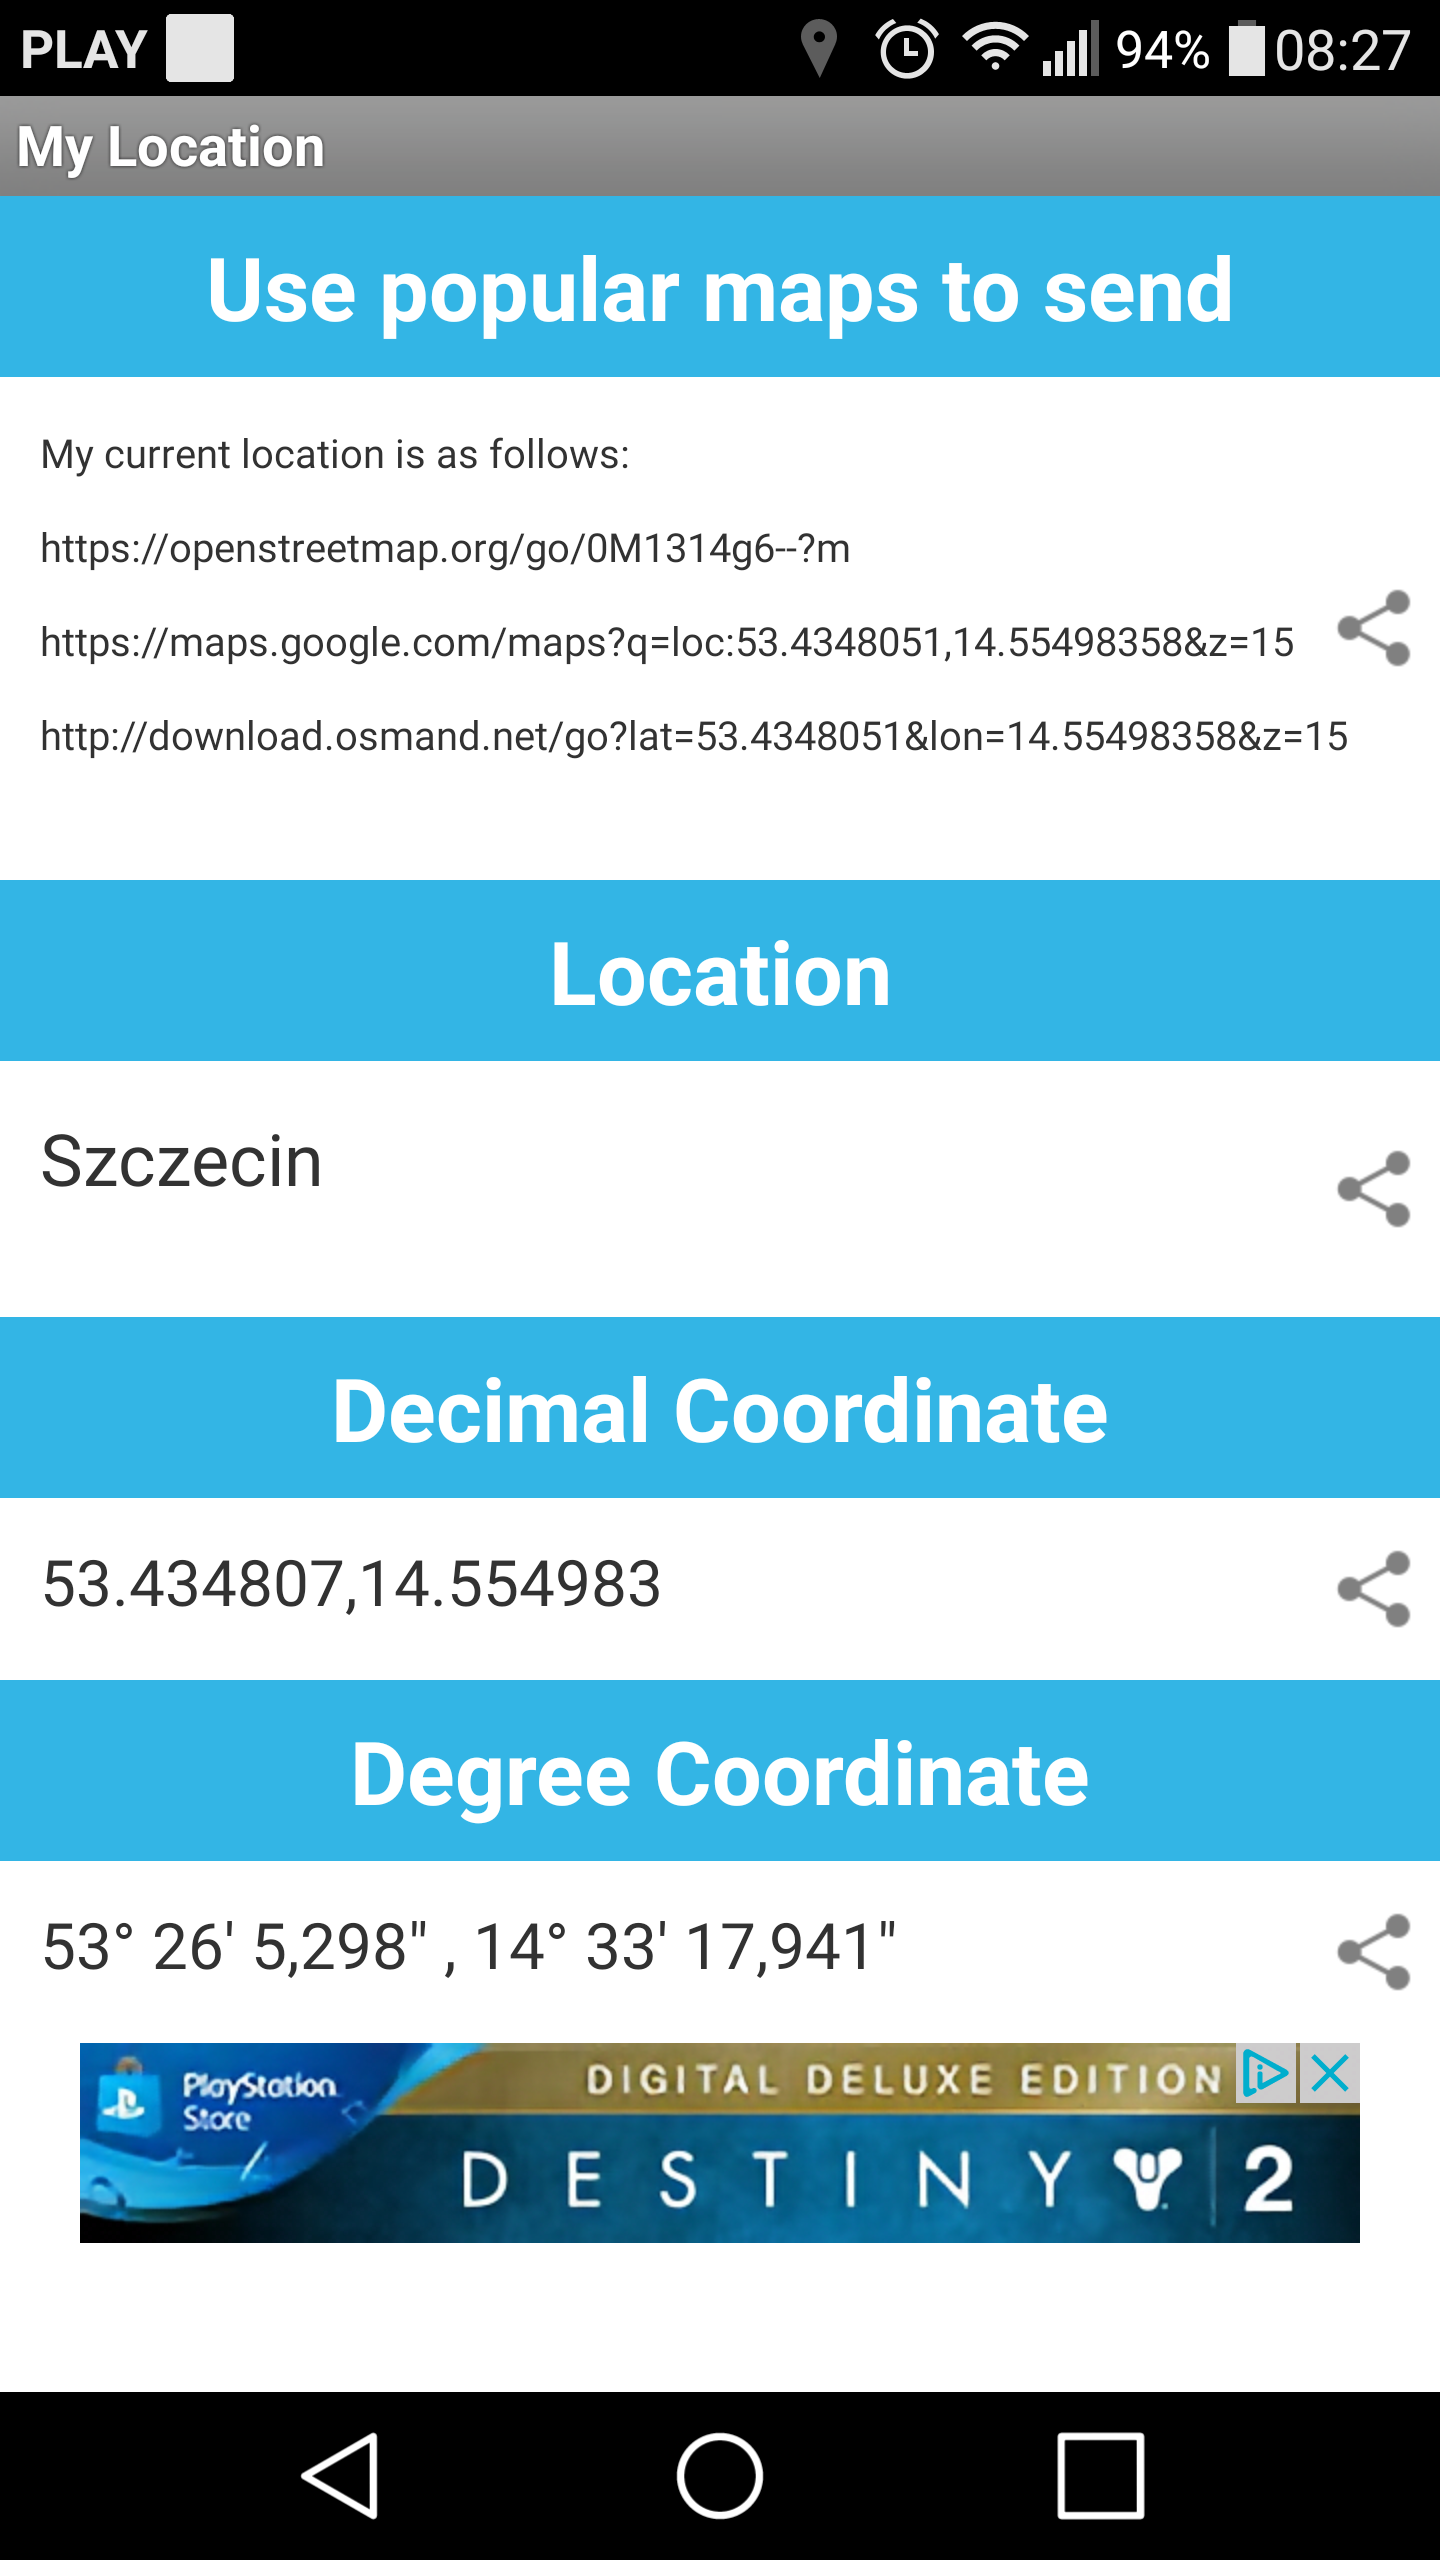 screenshot_2017-09-28-08-27-29